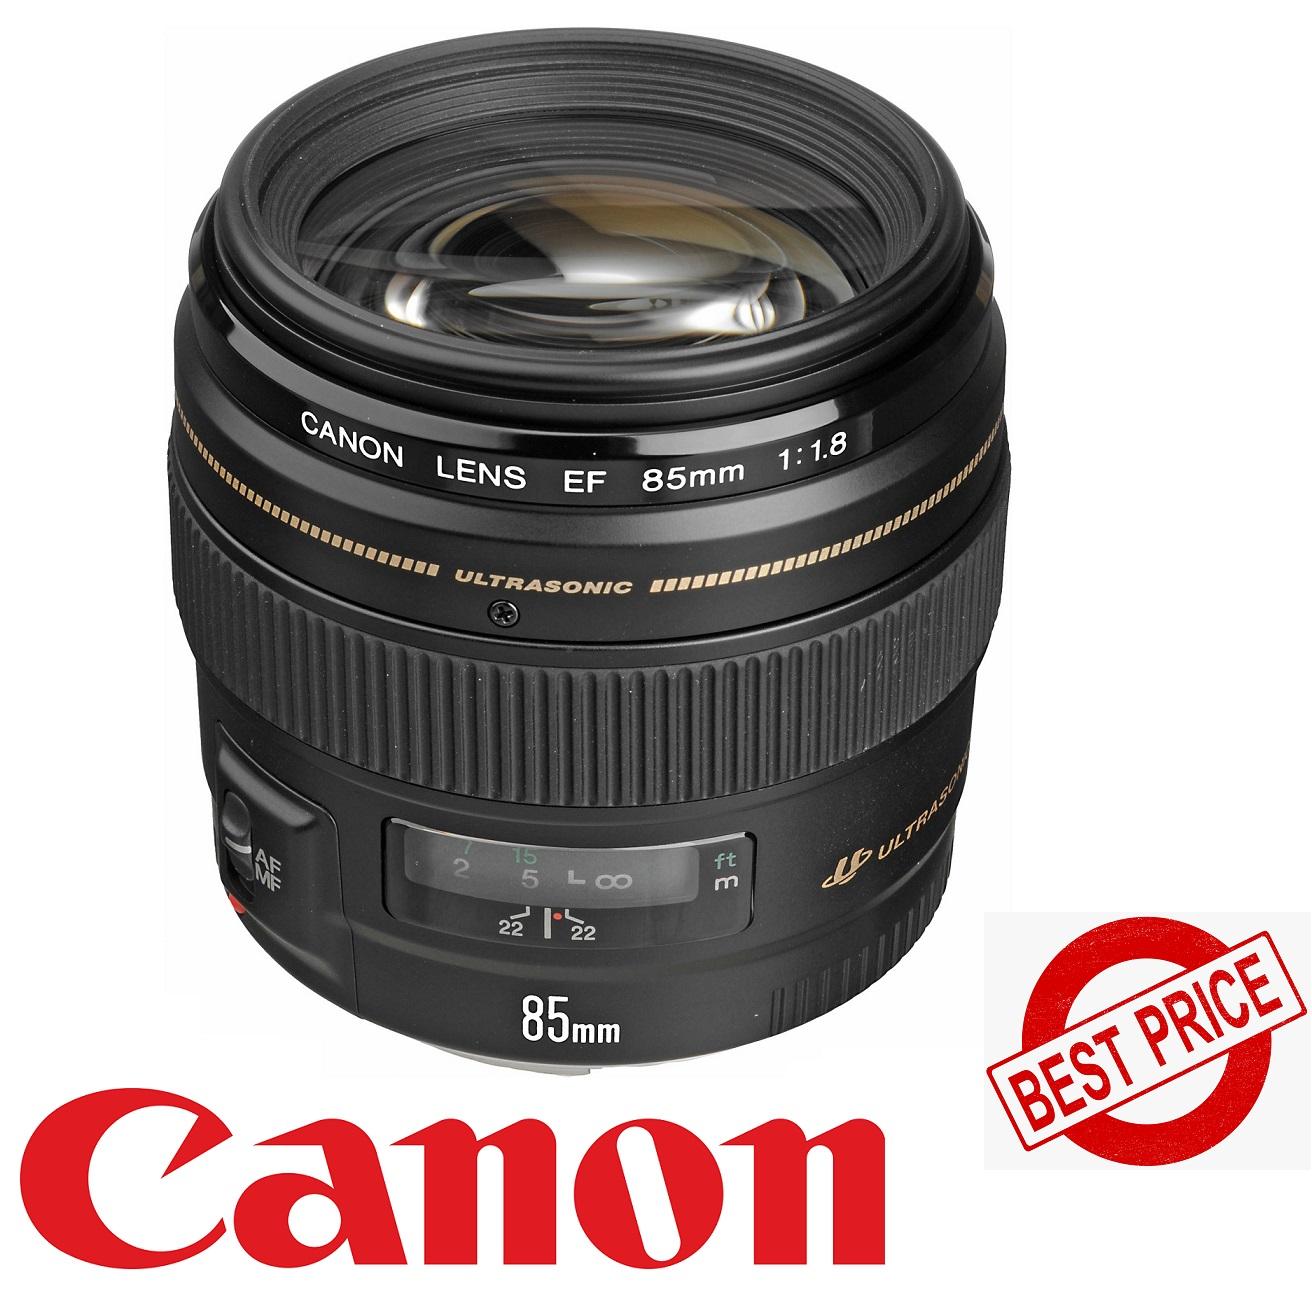 S410 Deluxe Neoprene Black Wide Neck Strap For The Canon Powershot S500 S330 S230 S110 S200 S300 S400 S100 Digital Cameras